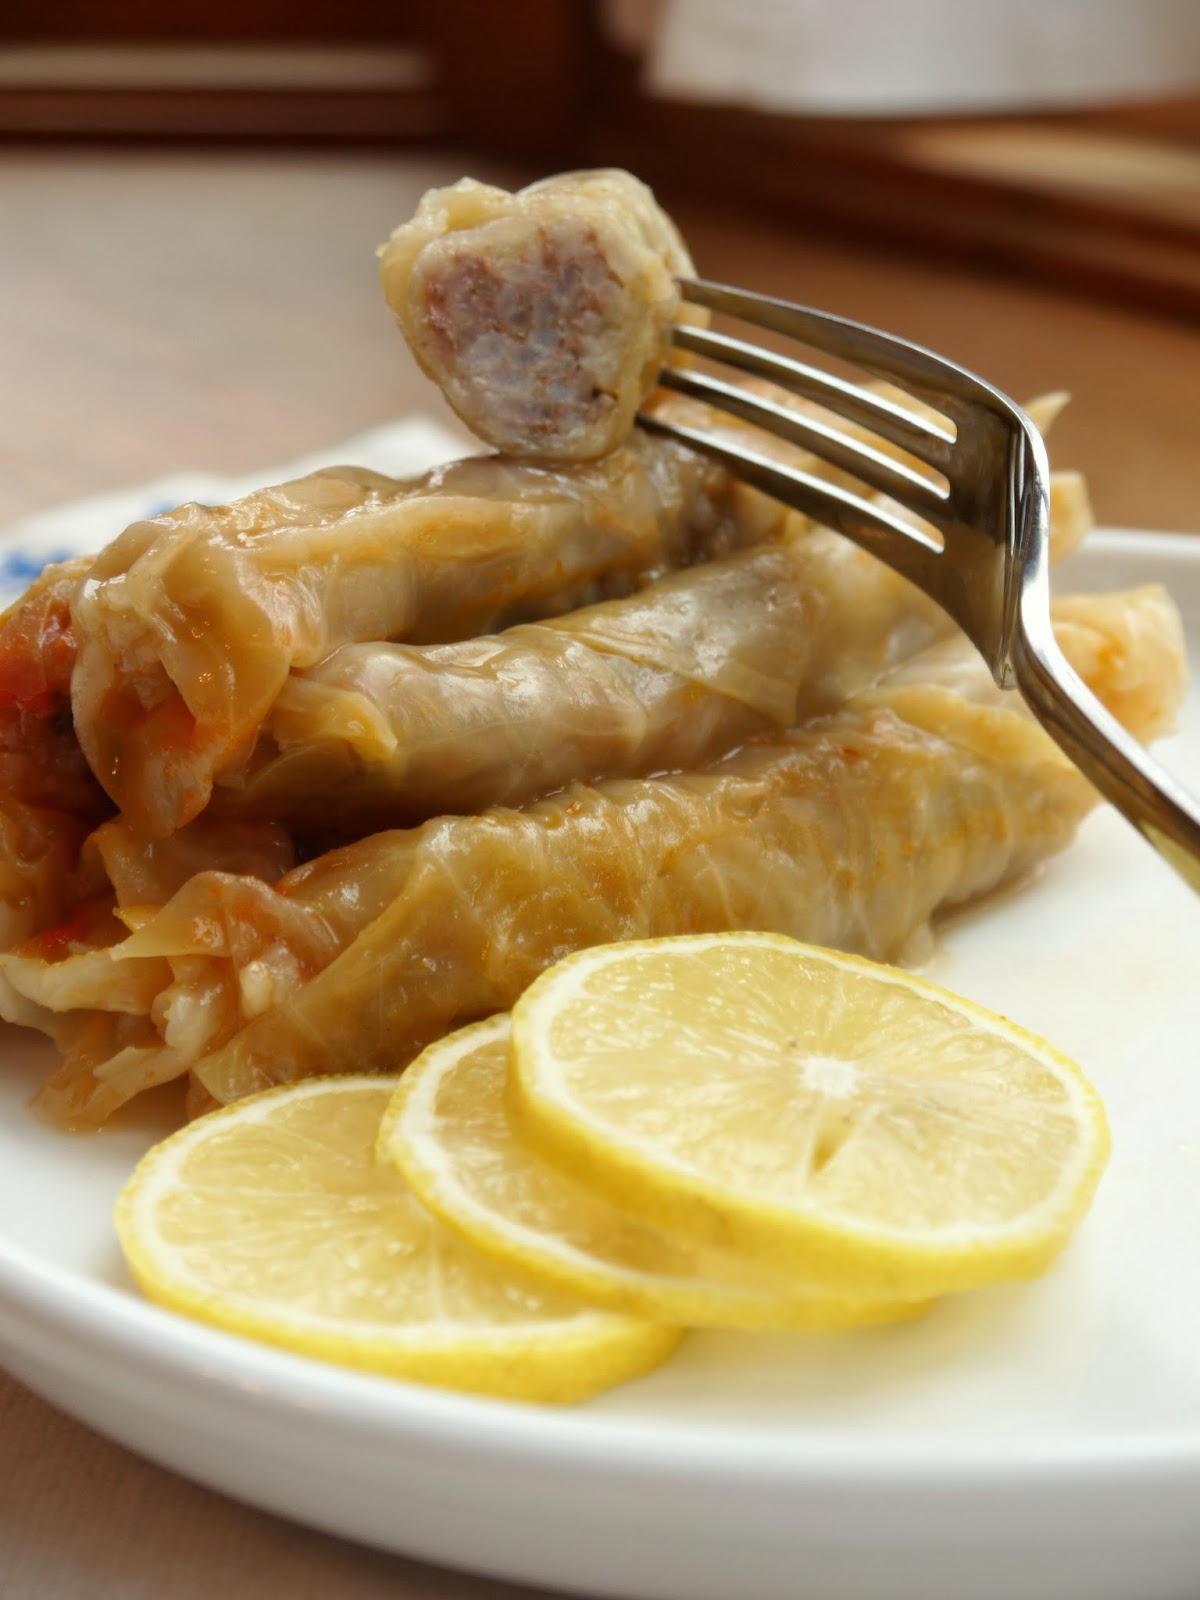 Mahshi malfouf stuffed cabbage rolls recipe of the day forumfinder Gallery